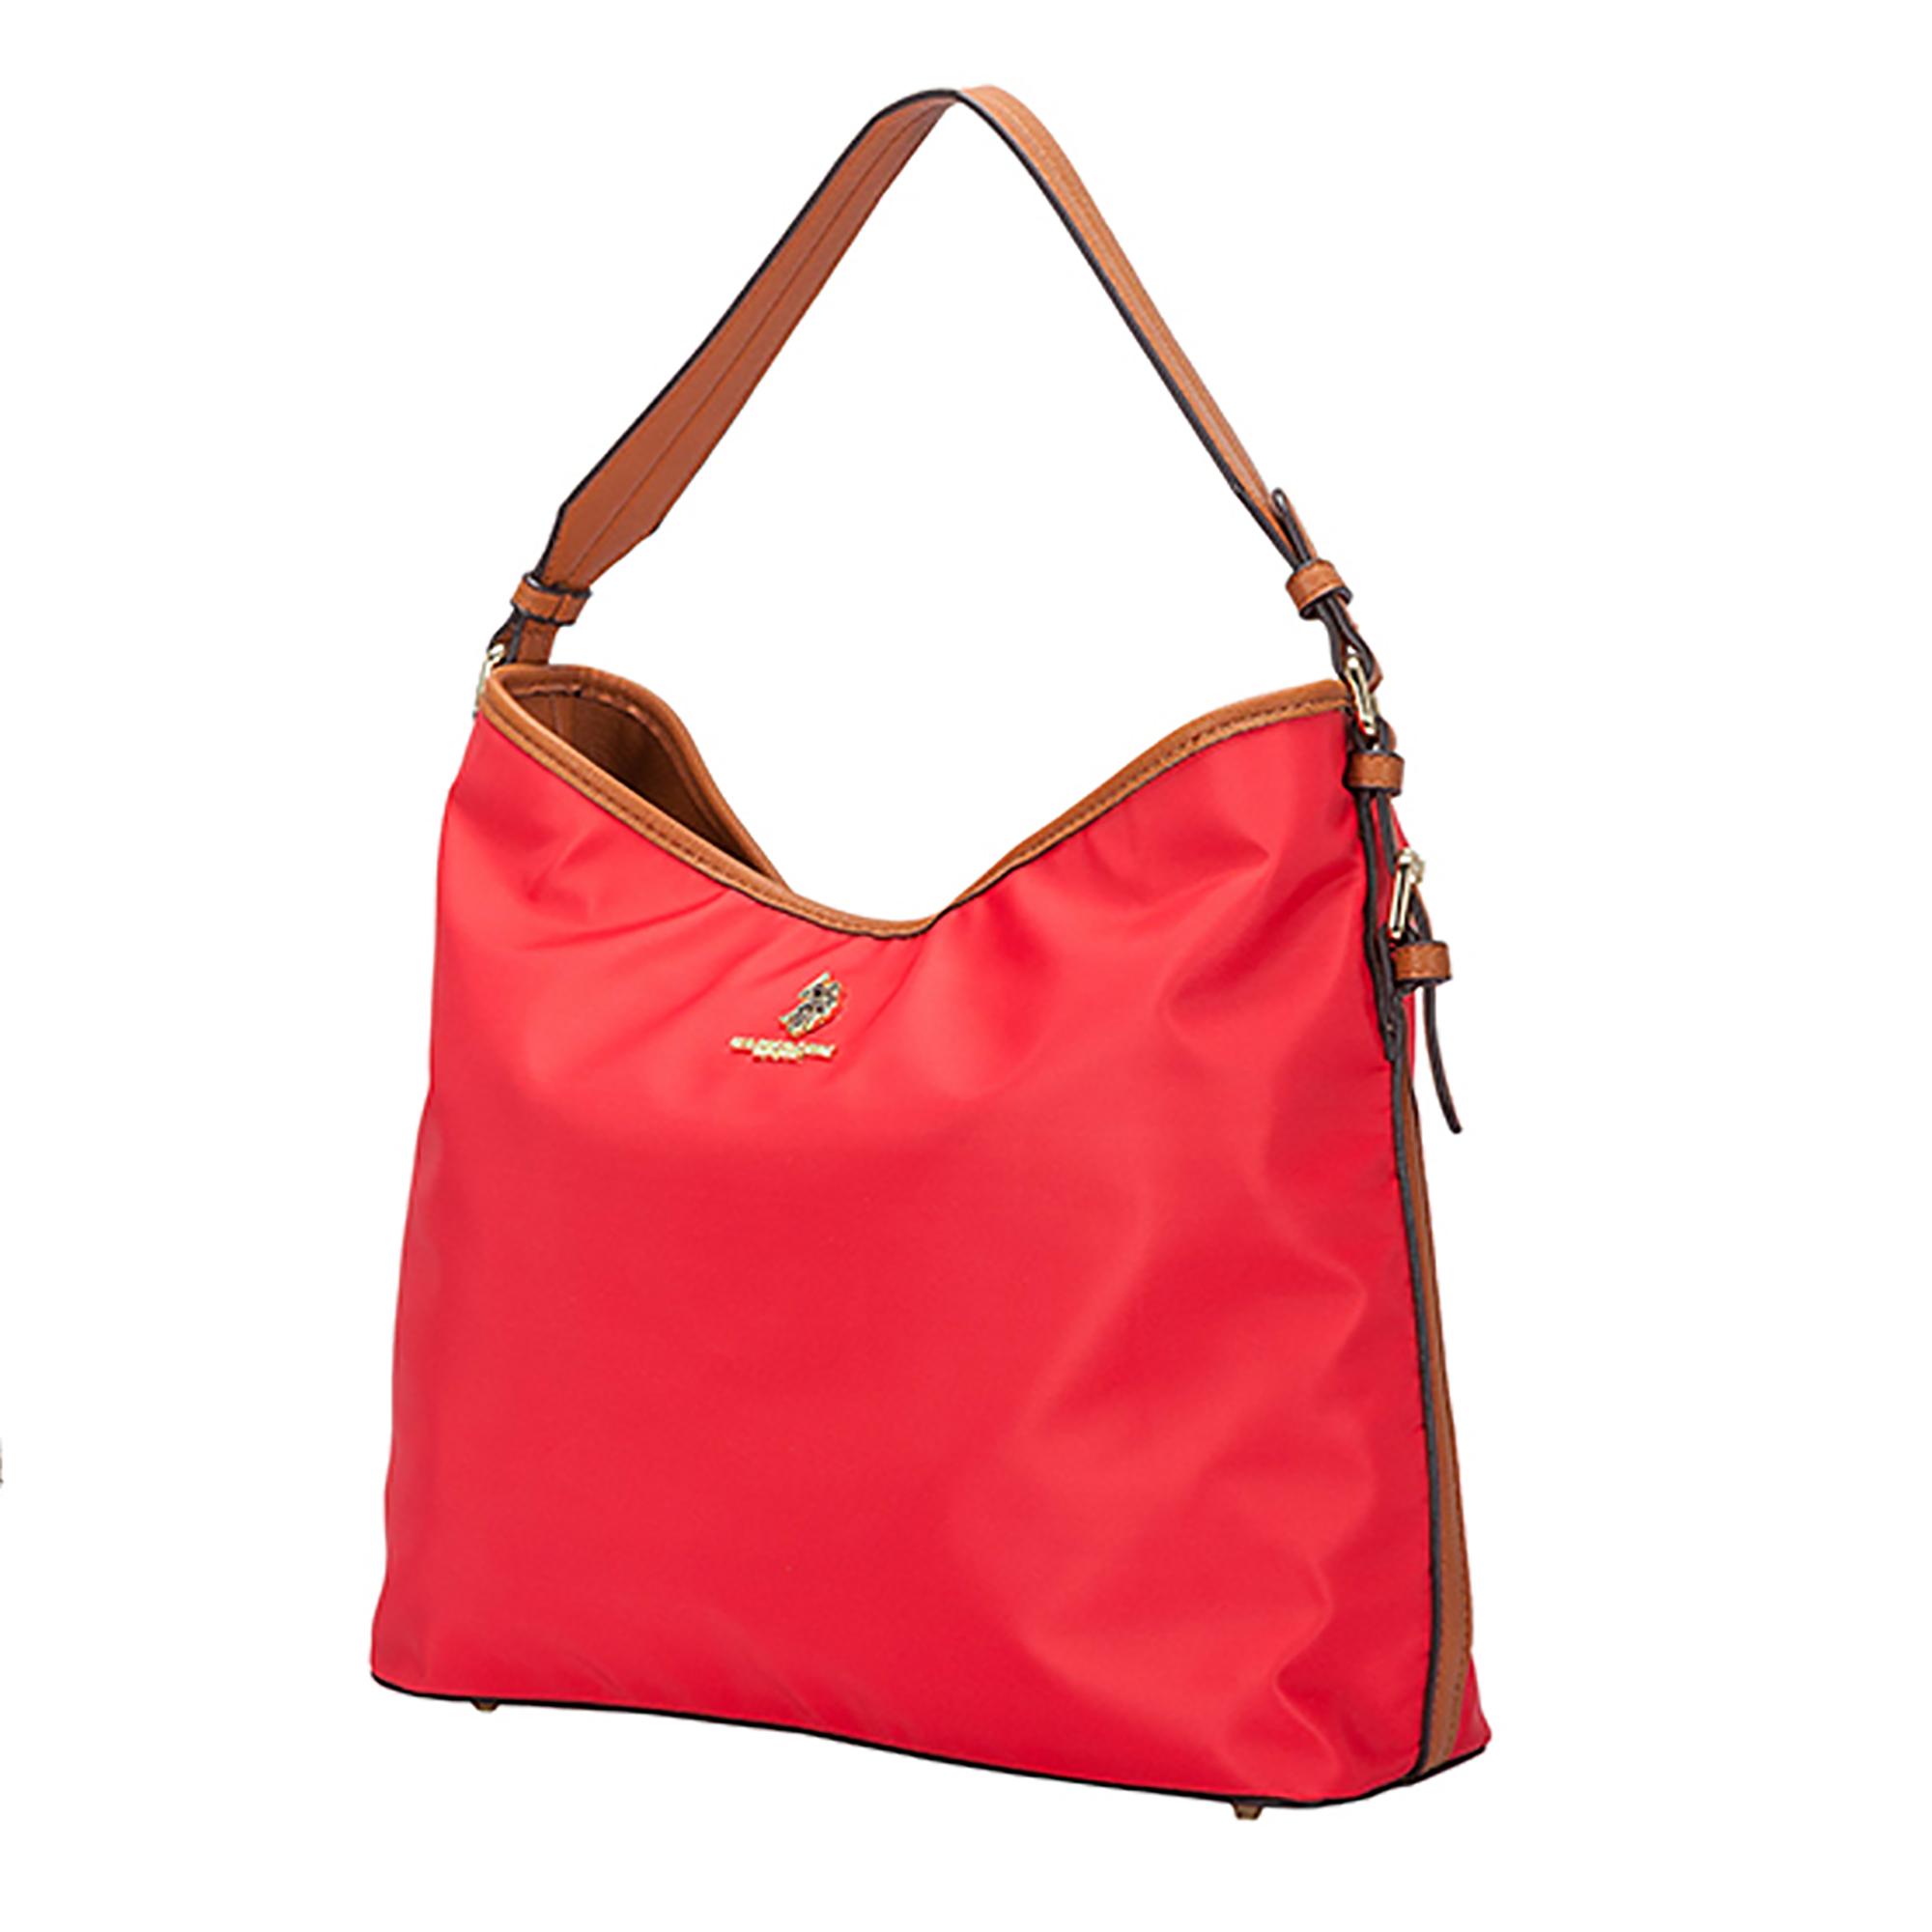 NEW-US-Polo-Assn-Houston-Hobo-Zip-Top-Handbag-Casual-Fashion-Nylon-Single-Strap thumbnail 11